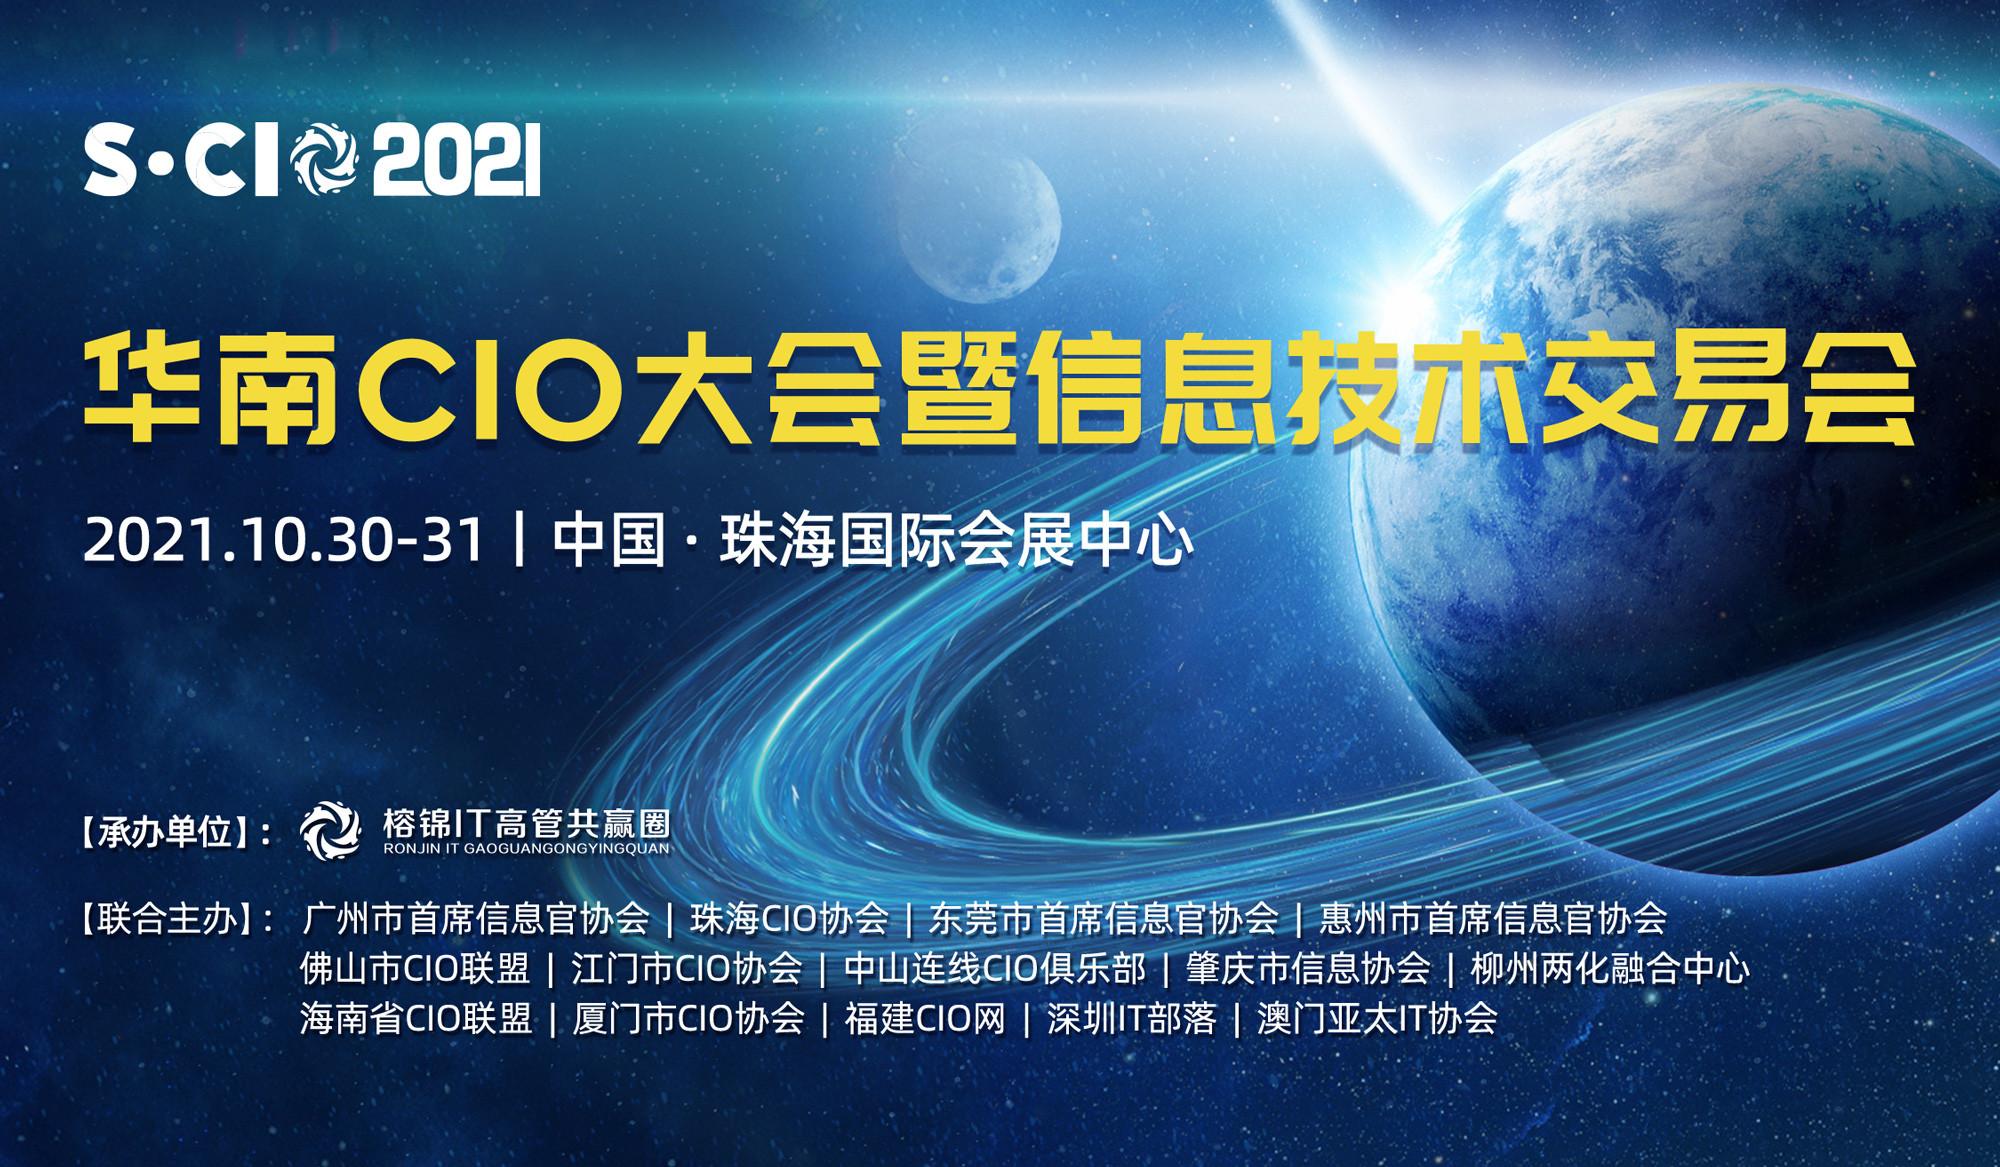 S-CIO 2021 第5届华南CIO大会